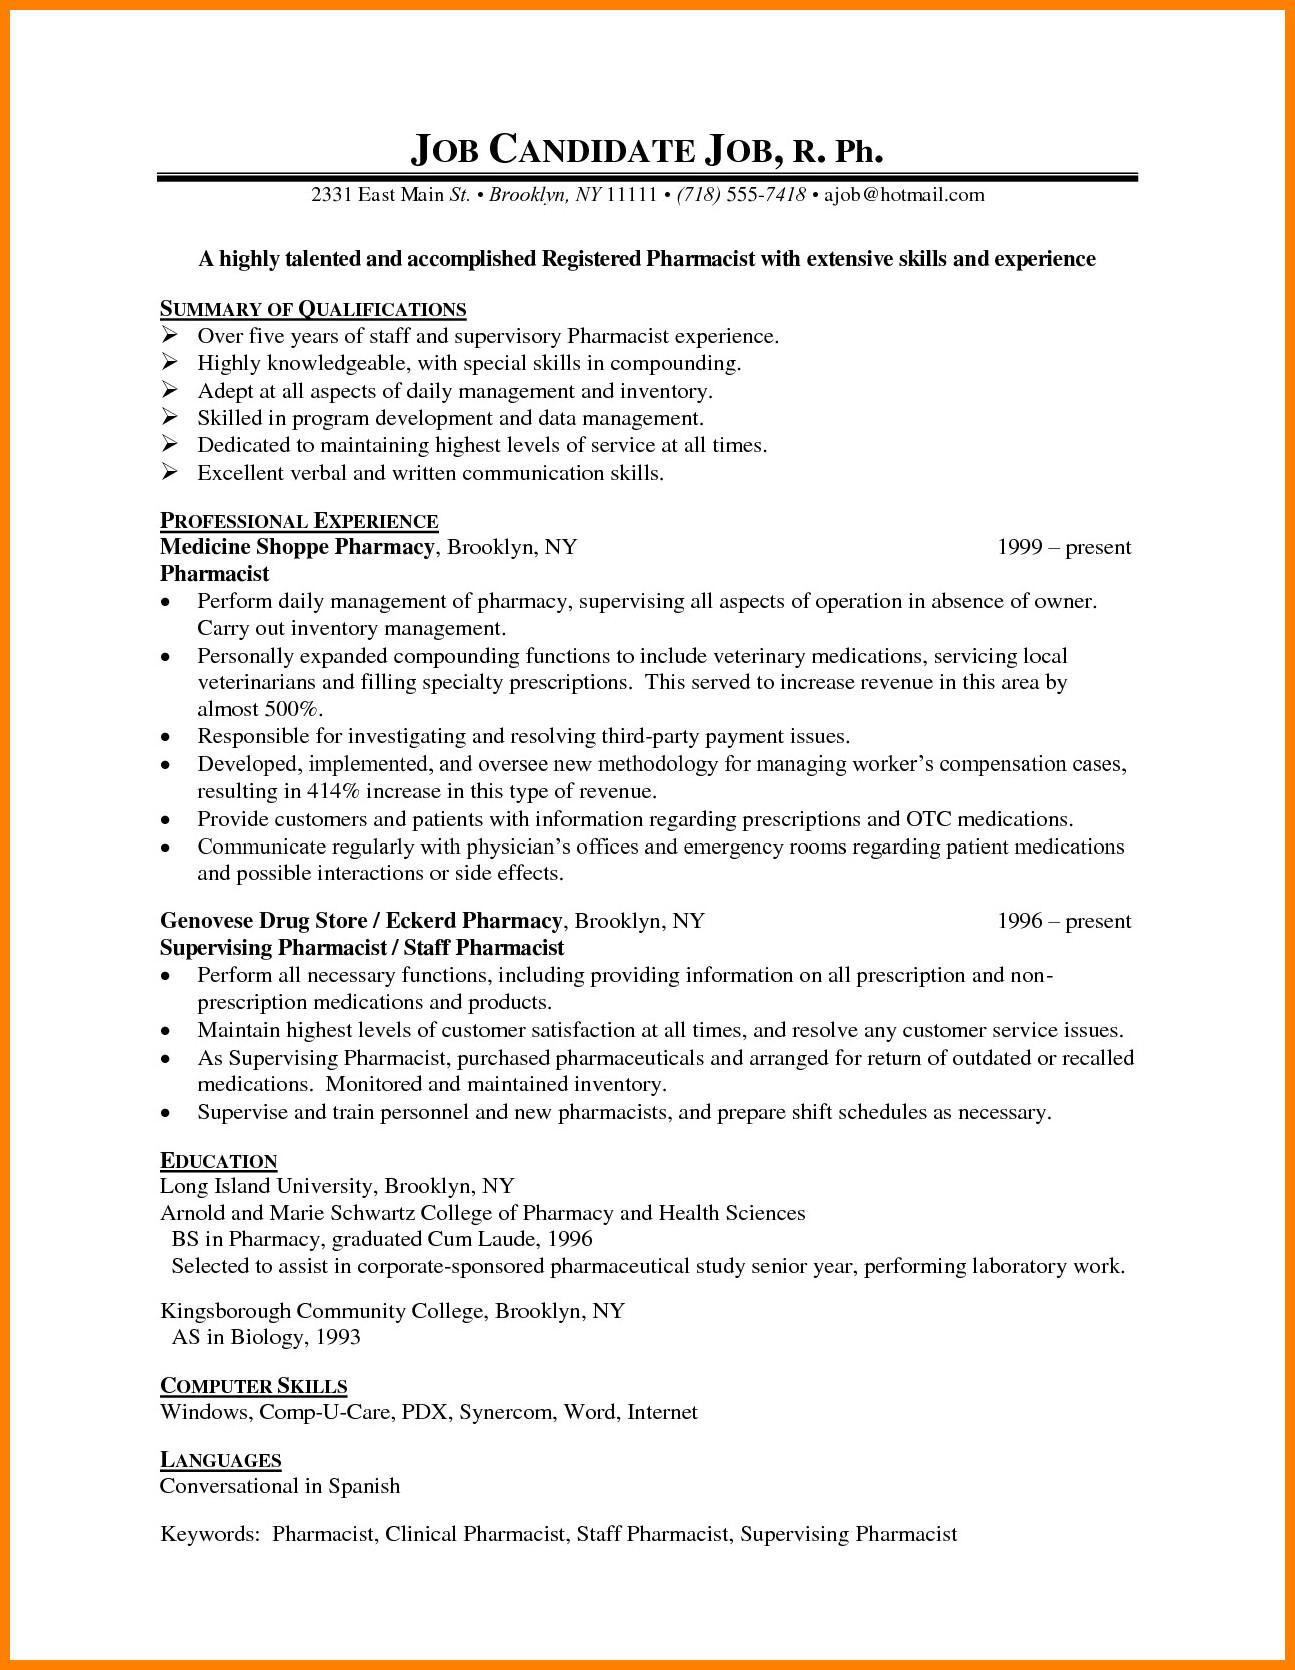 Pharmacy Curriculum Vitae Template 8 Cv Sample for Pharmacist